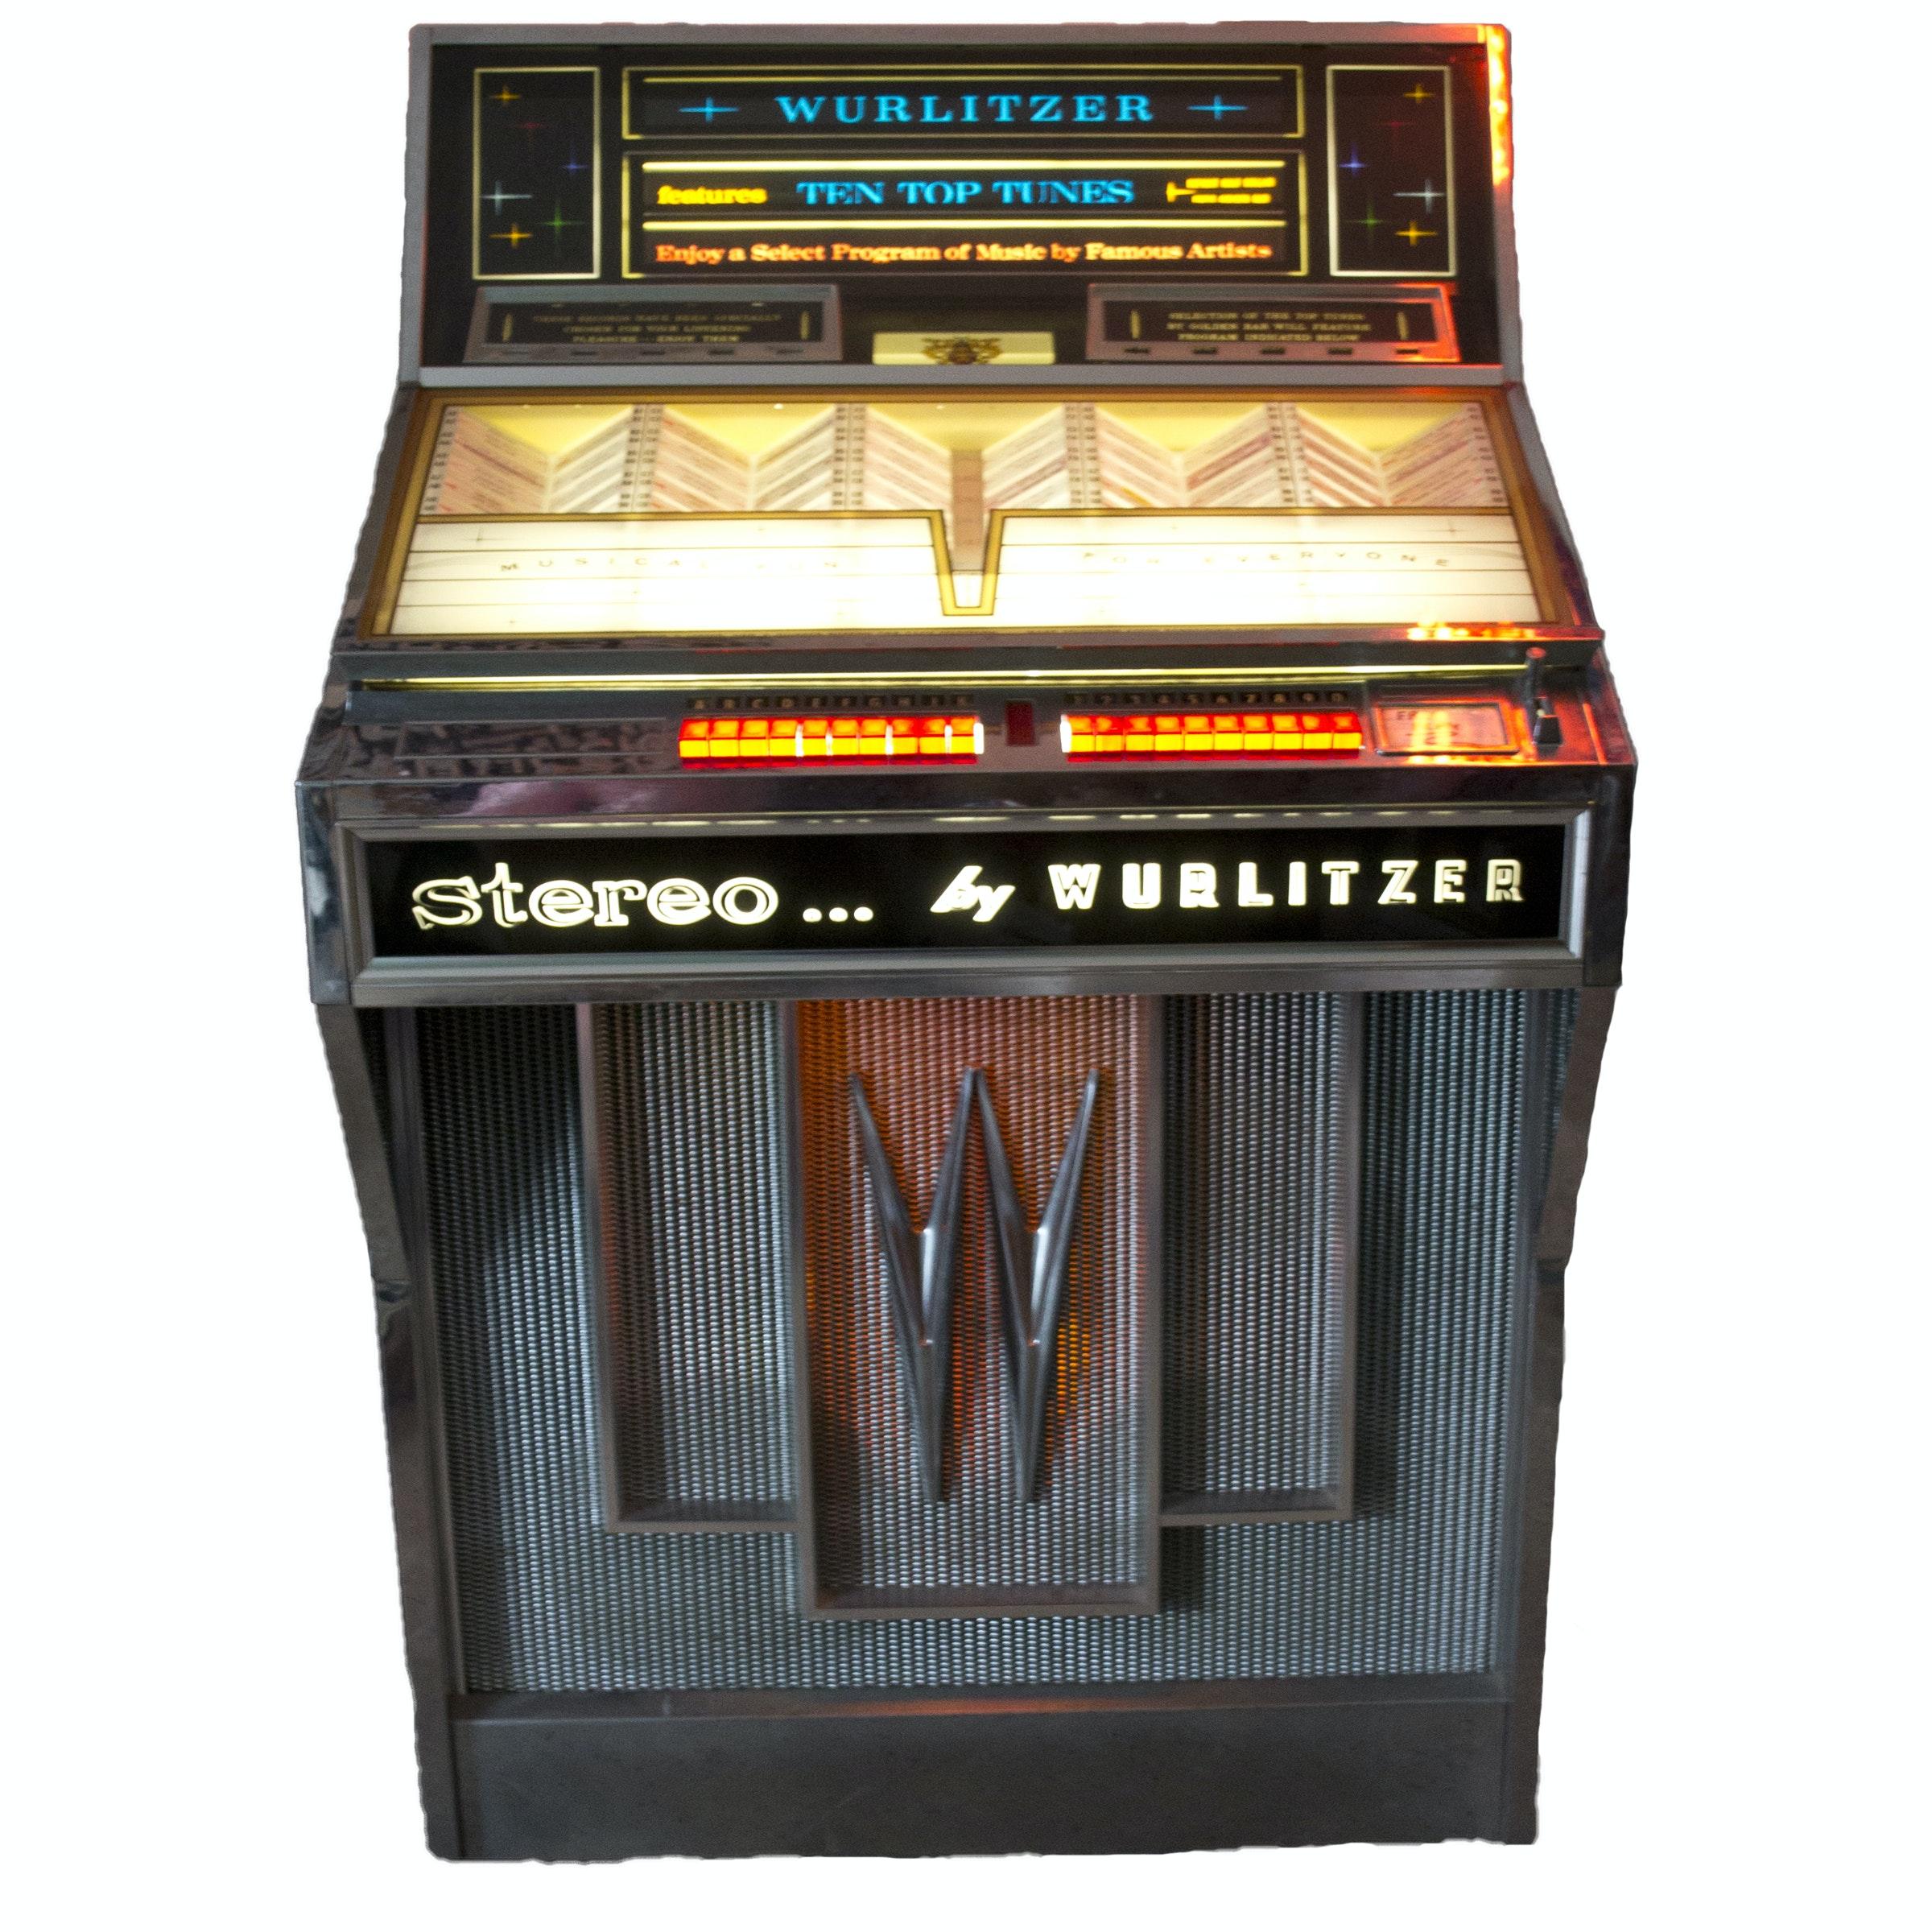 1960s Wurlitzer Model 2810 Jukebox